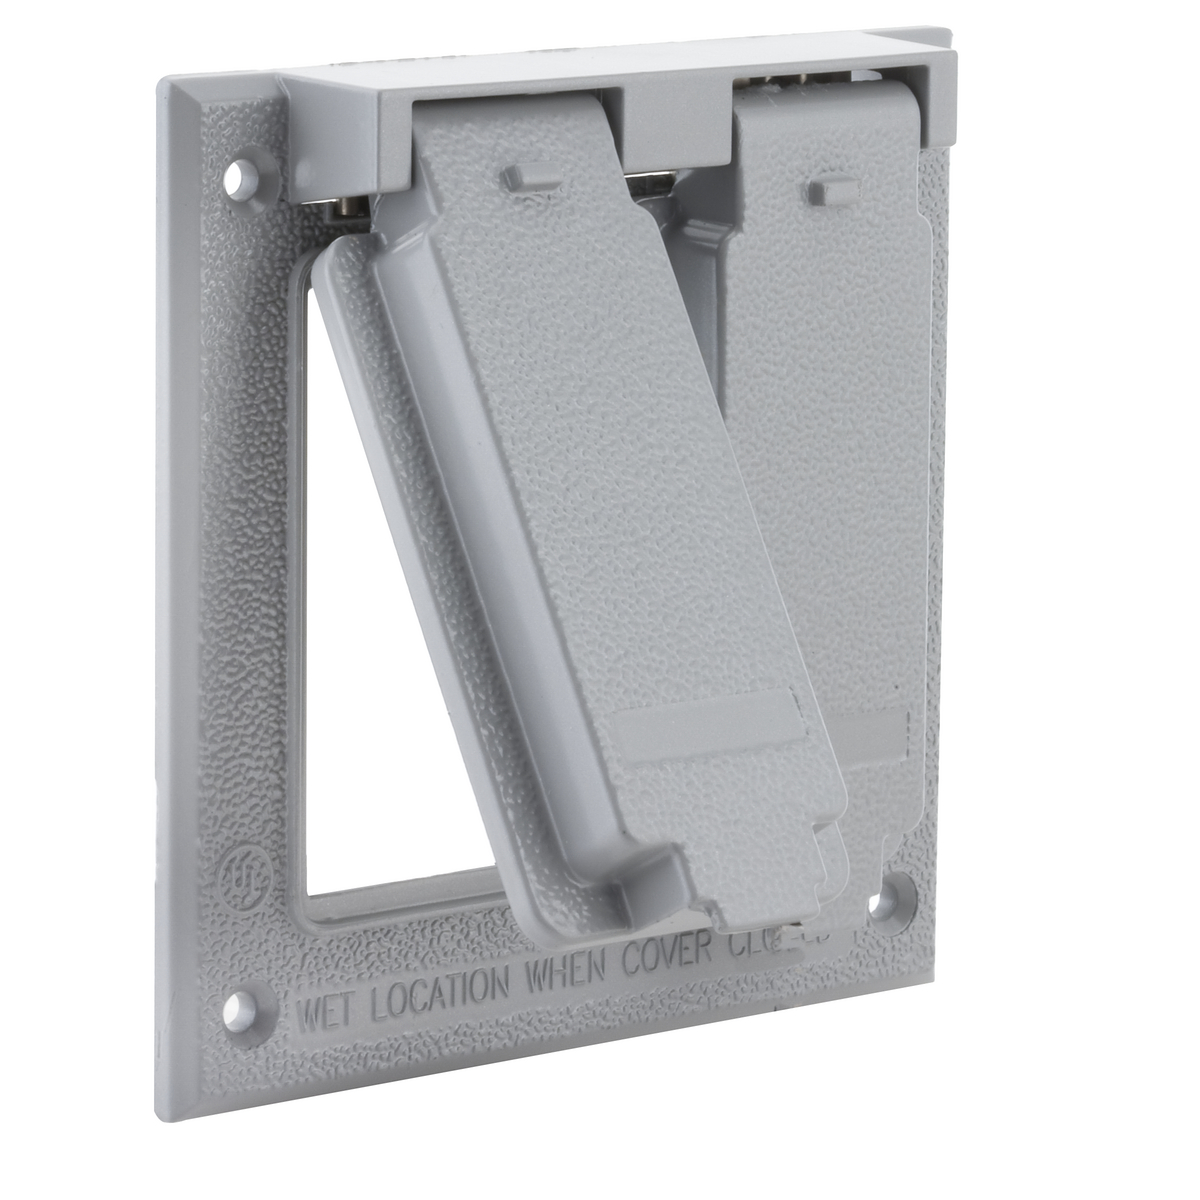 BELL,5145-0,2G WP COVER BOX MT (2) GFCI - GRAY